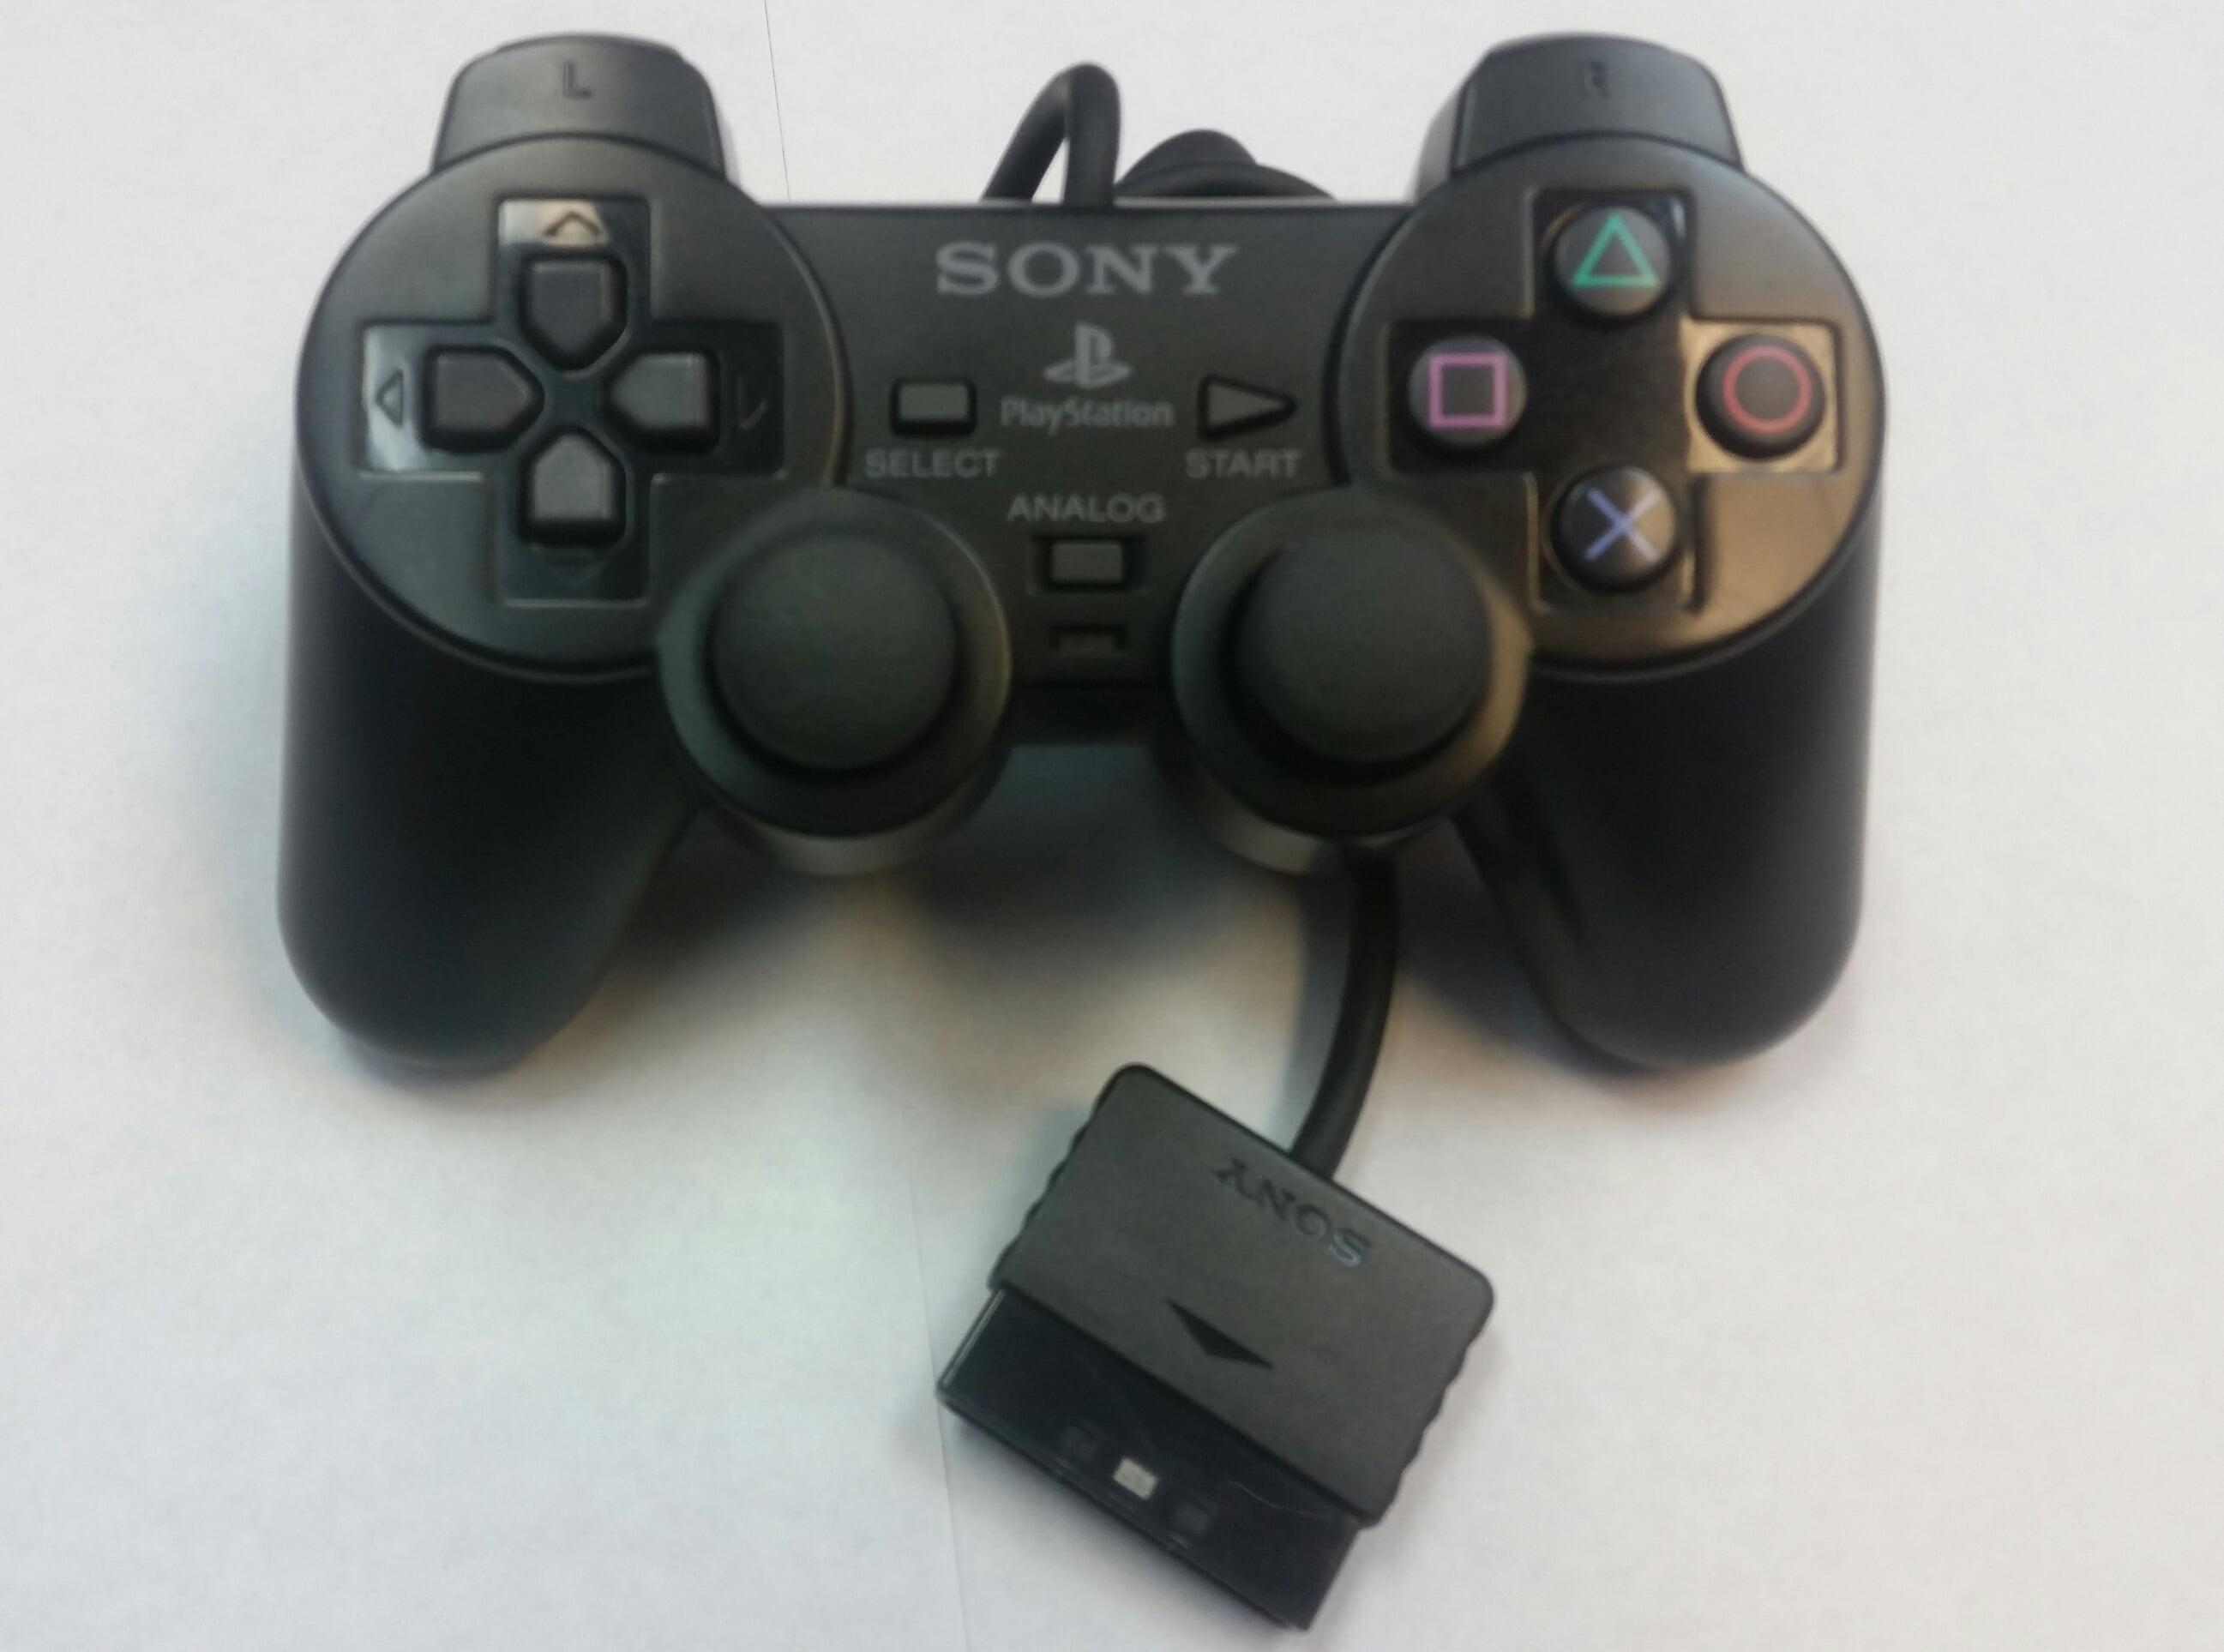 Sony Playstation 2 PS2 Original Genuine Controller (refurbished)